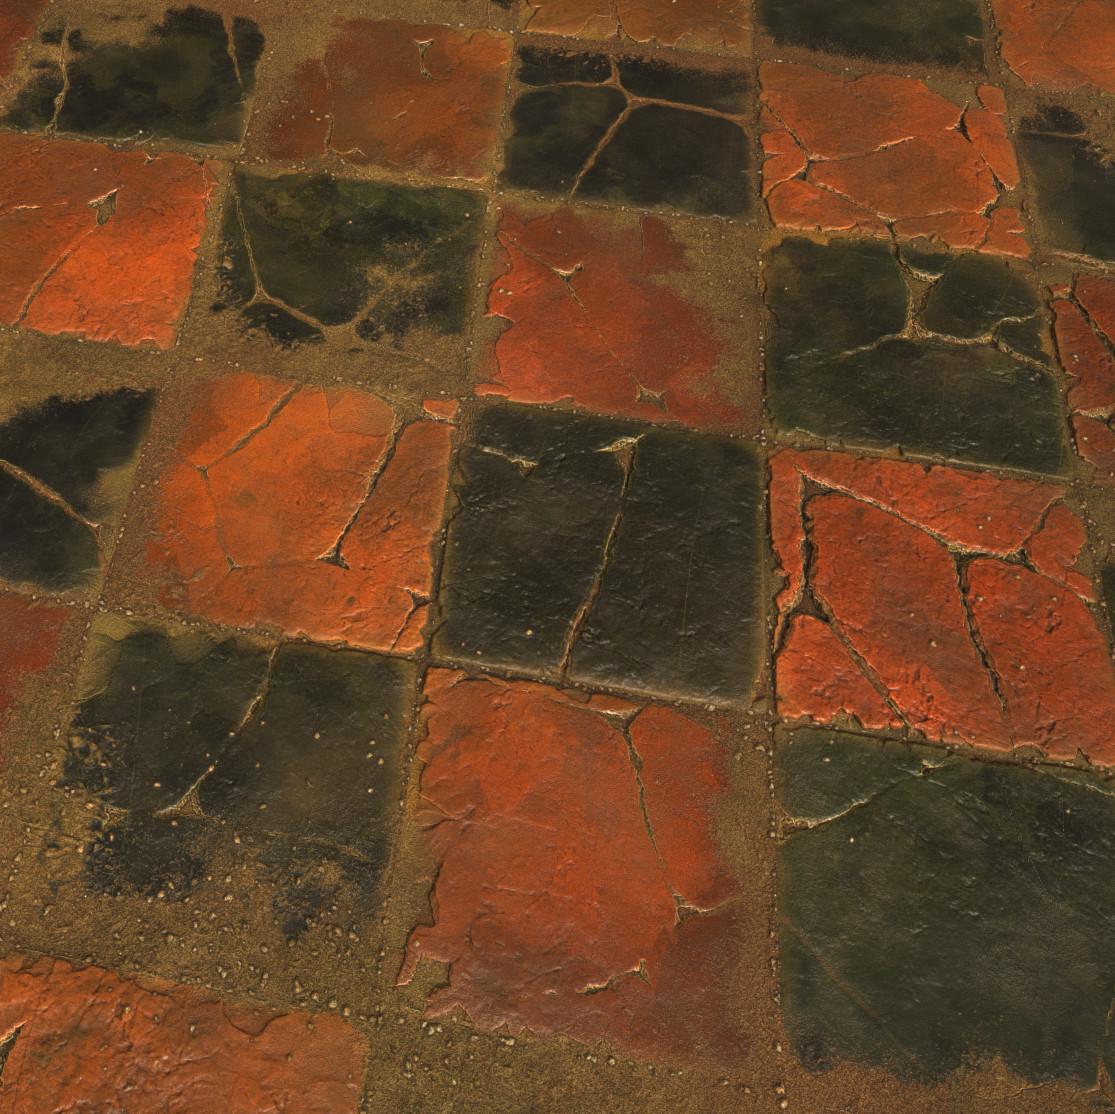 Substance_Designer - 100% procedural Worn Stone Floor Tiles